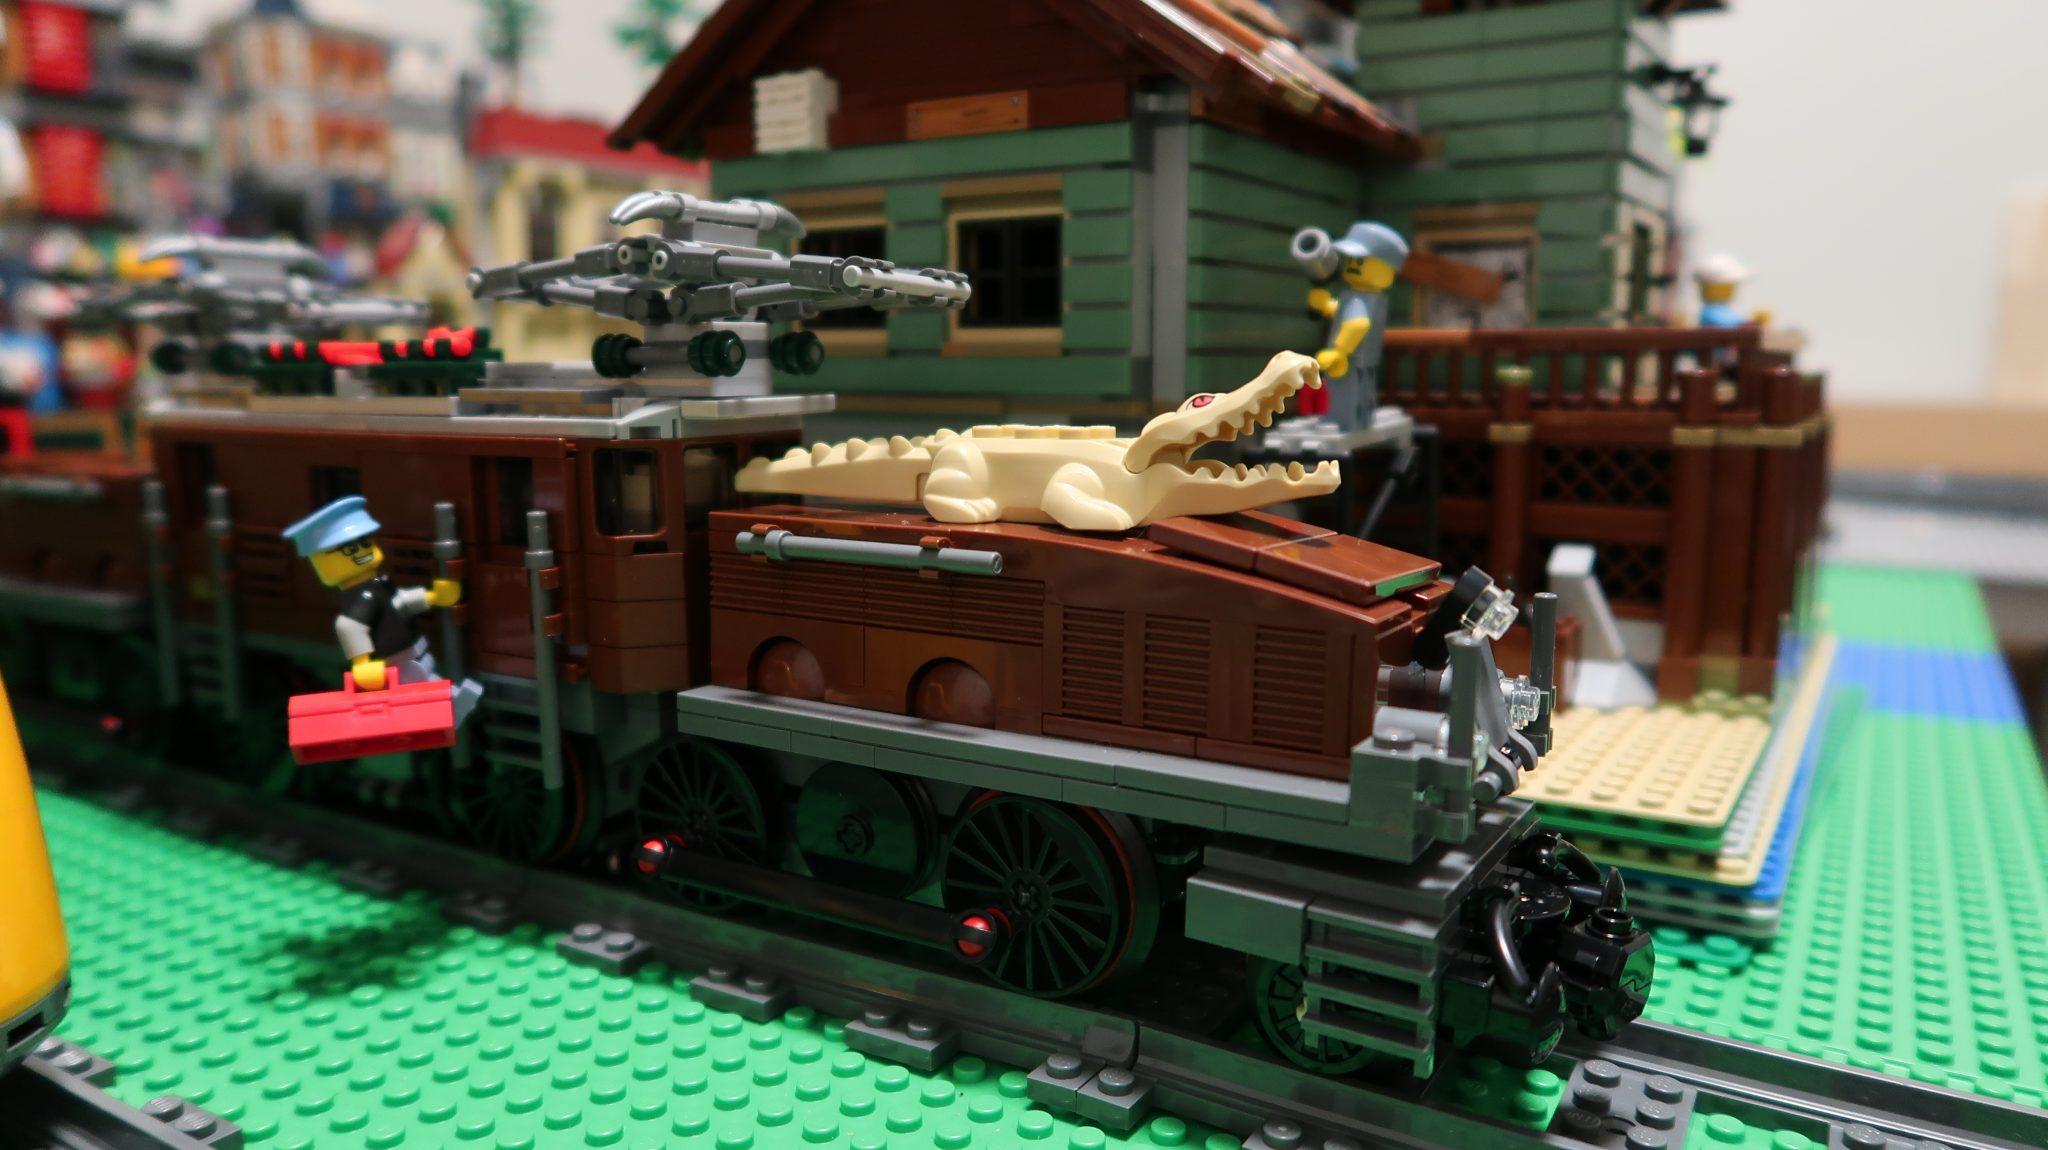 Choo! Choo! The train now pulling into Studsburg is the LEGO crocodile locomotive 10277!